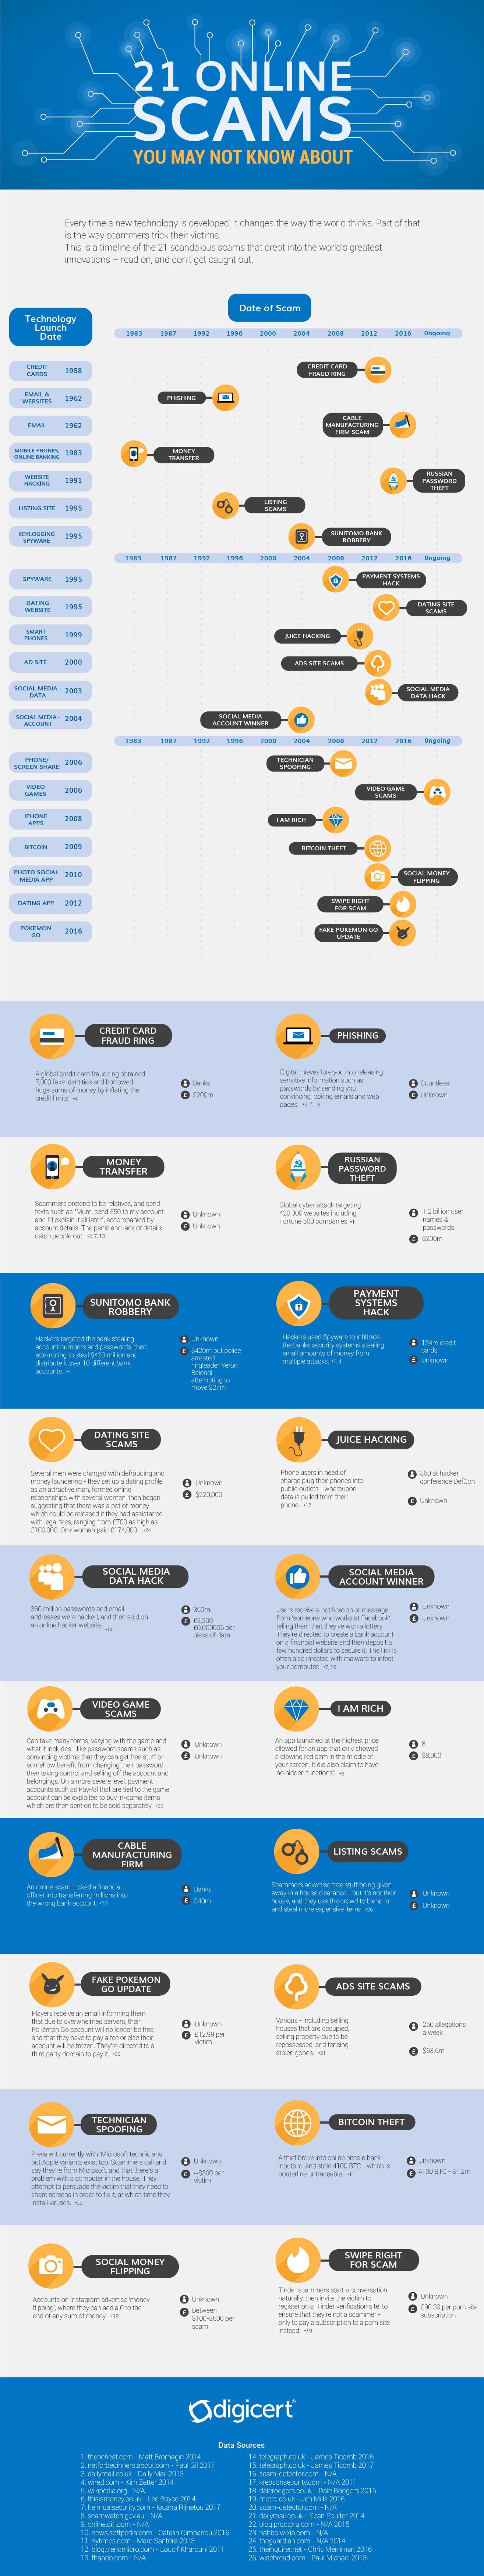 Online-Scam-infographic